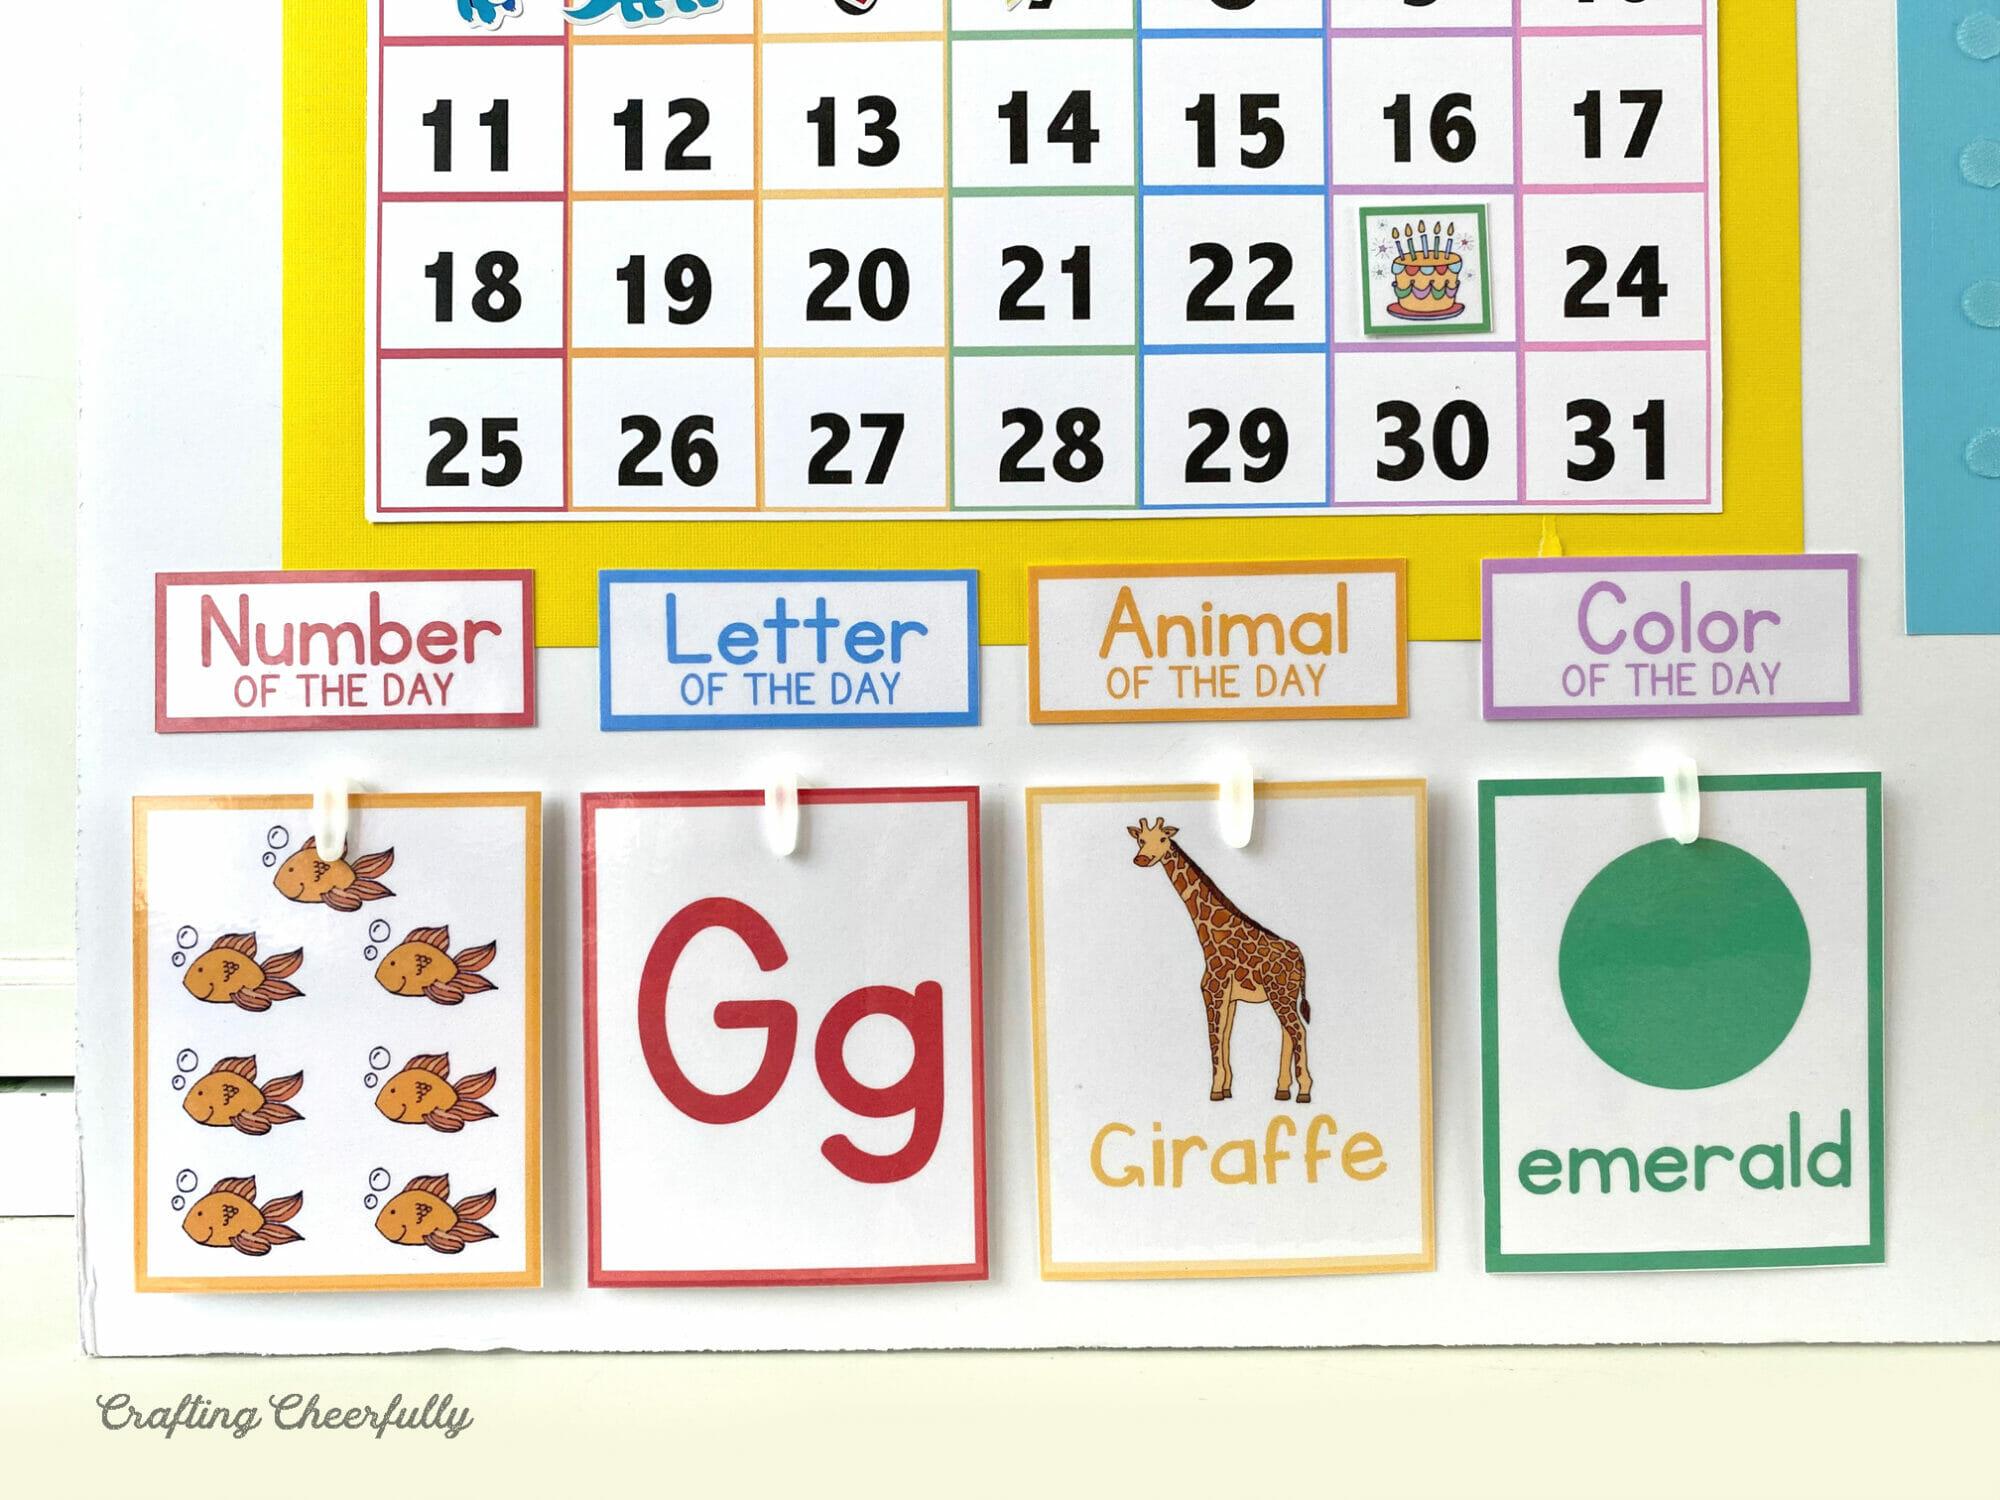 Preschool Learning Cards on DIY Morning Calendar Board